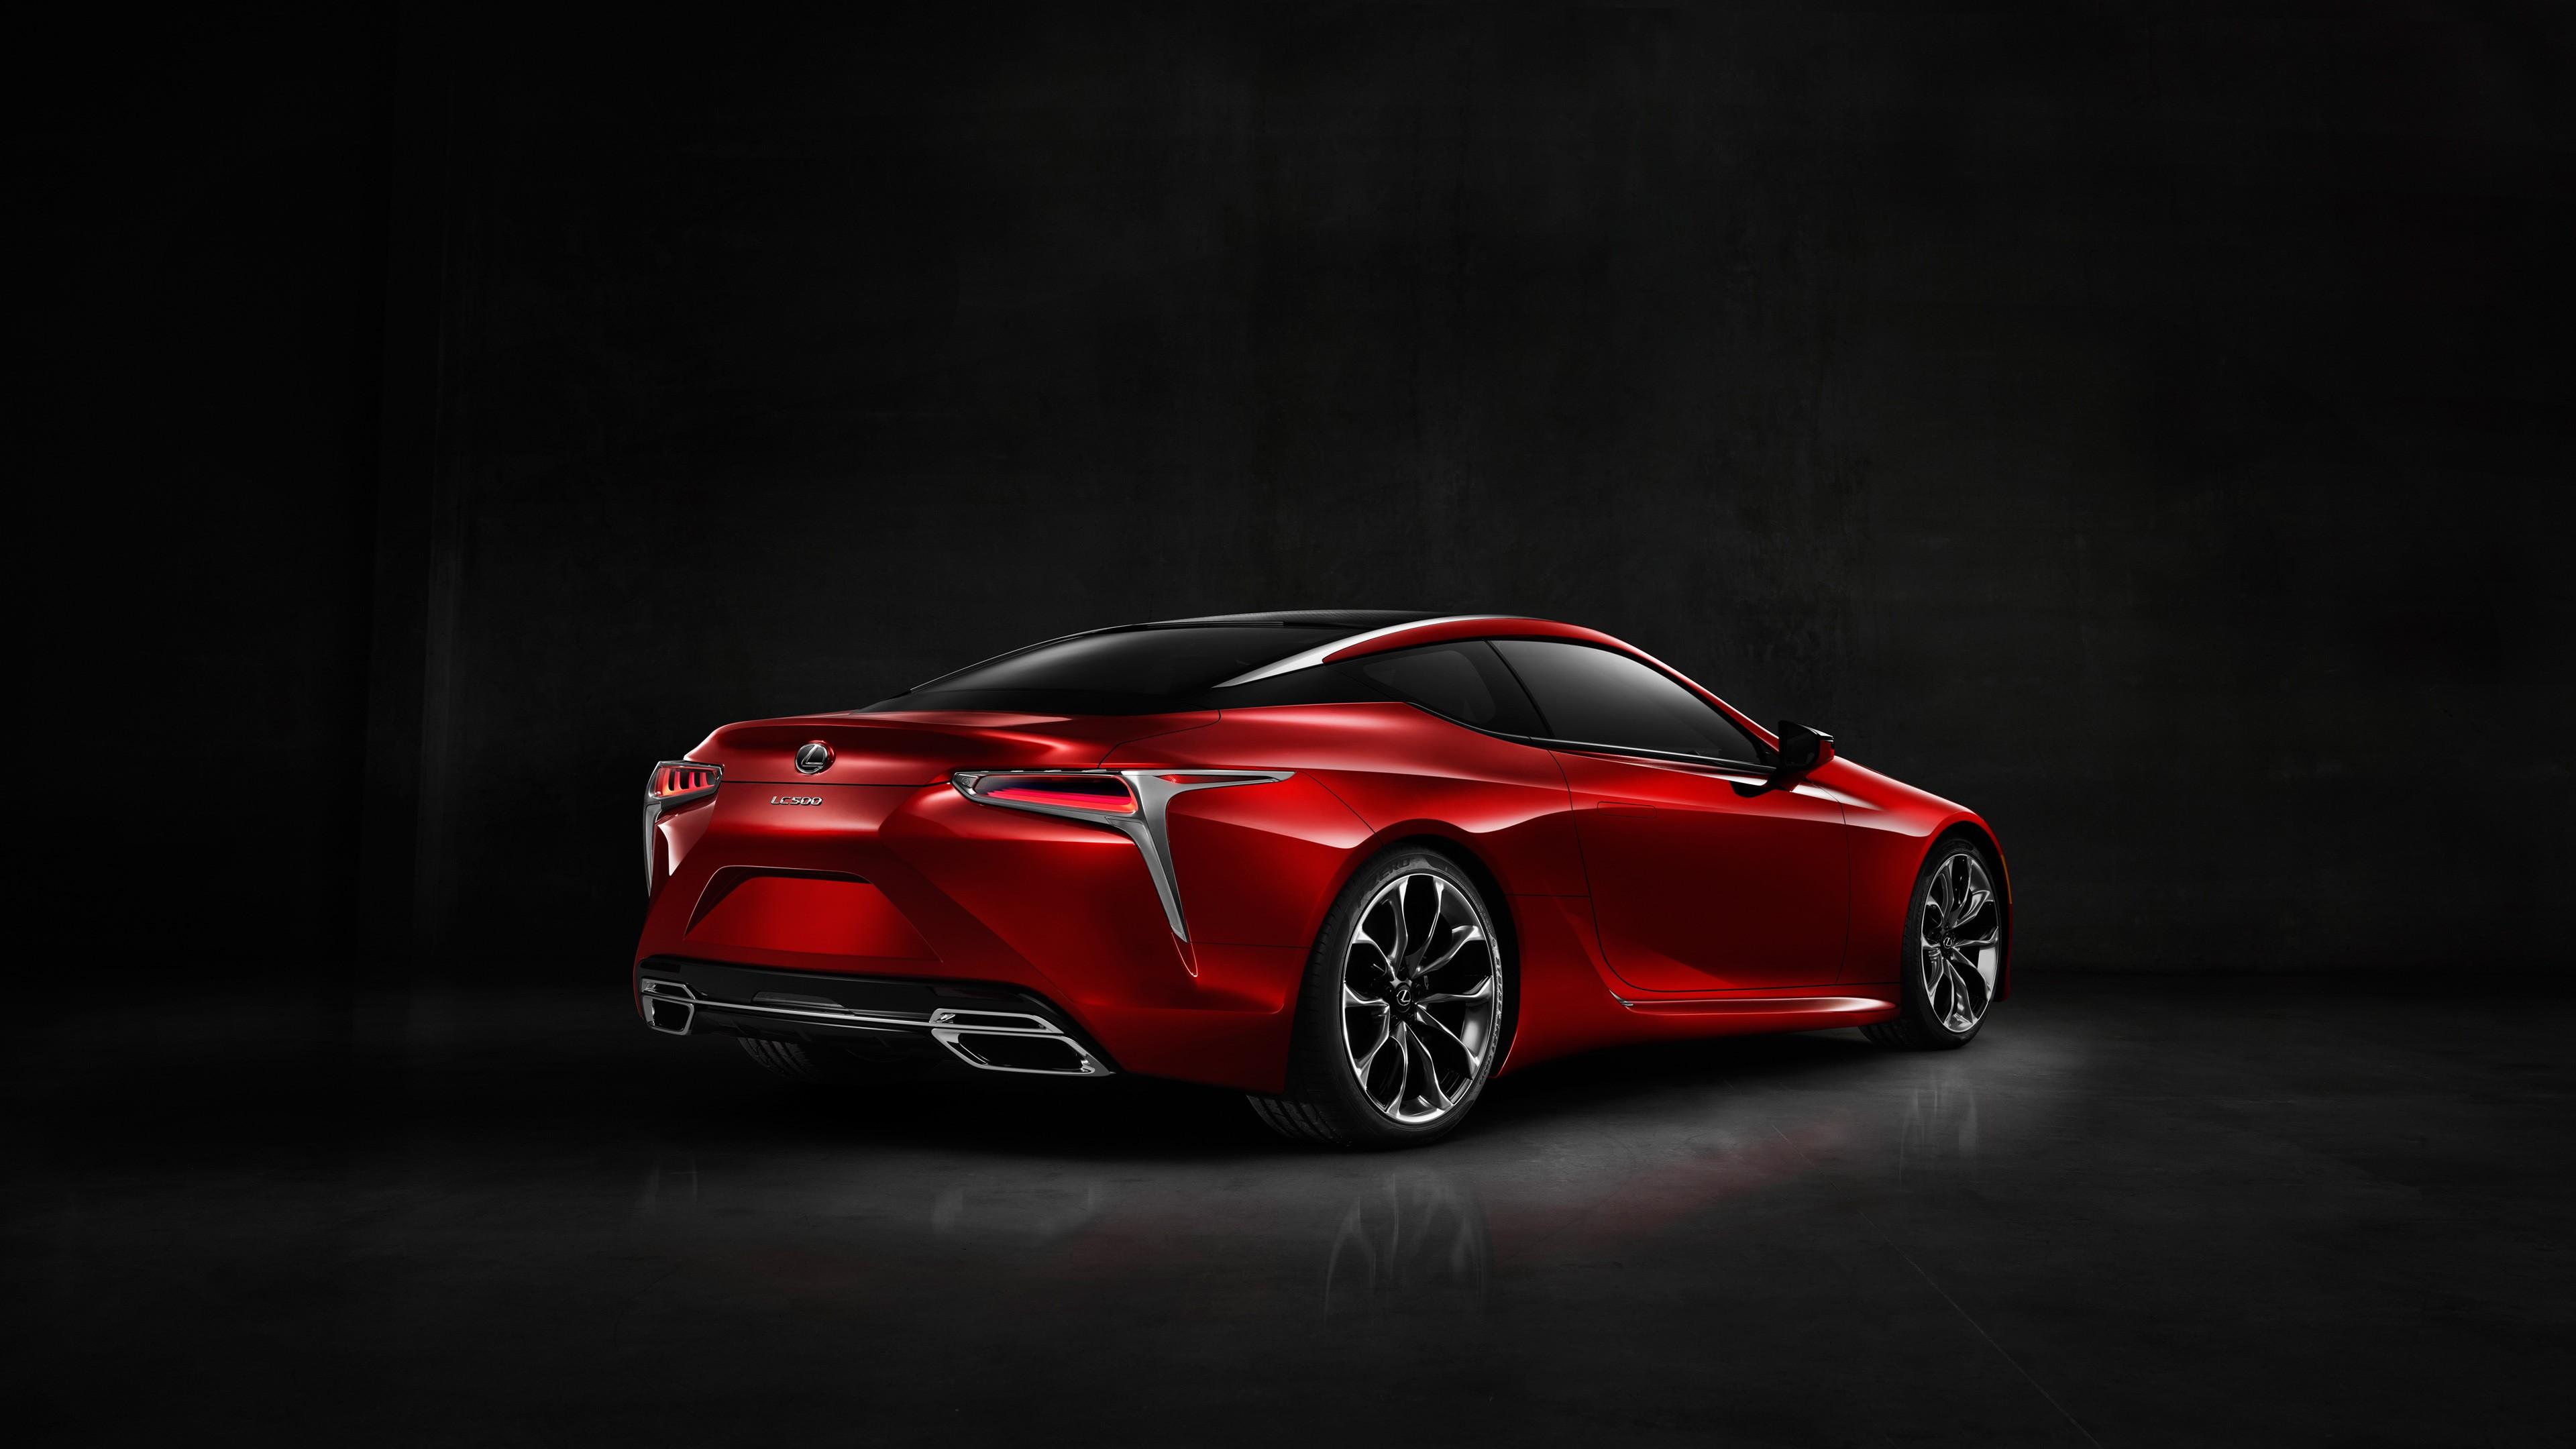 lexus lc 500 new york auto show 2 wallpaper hd car